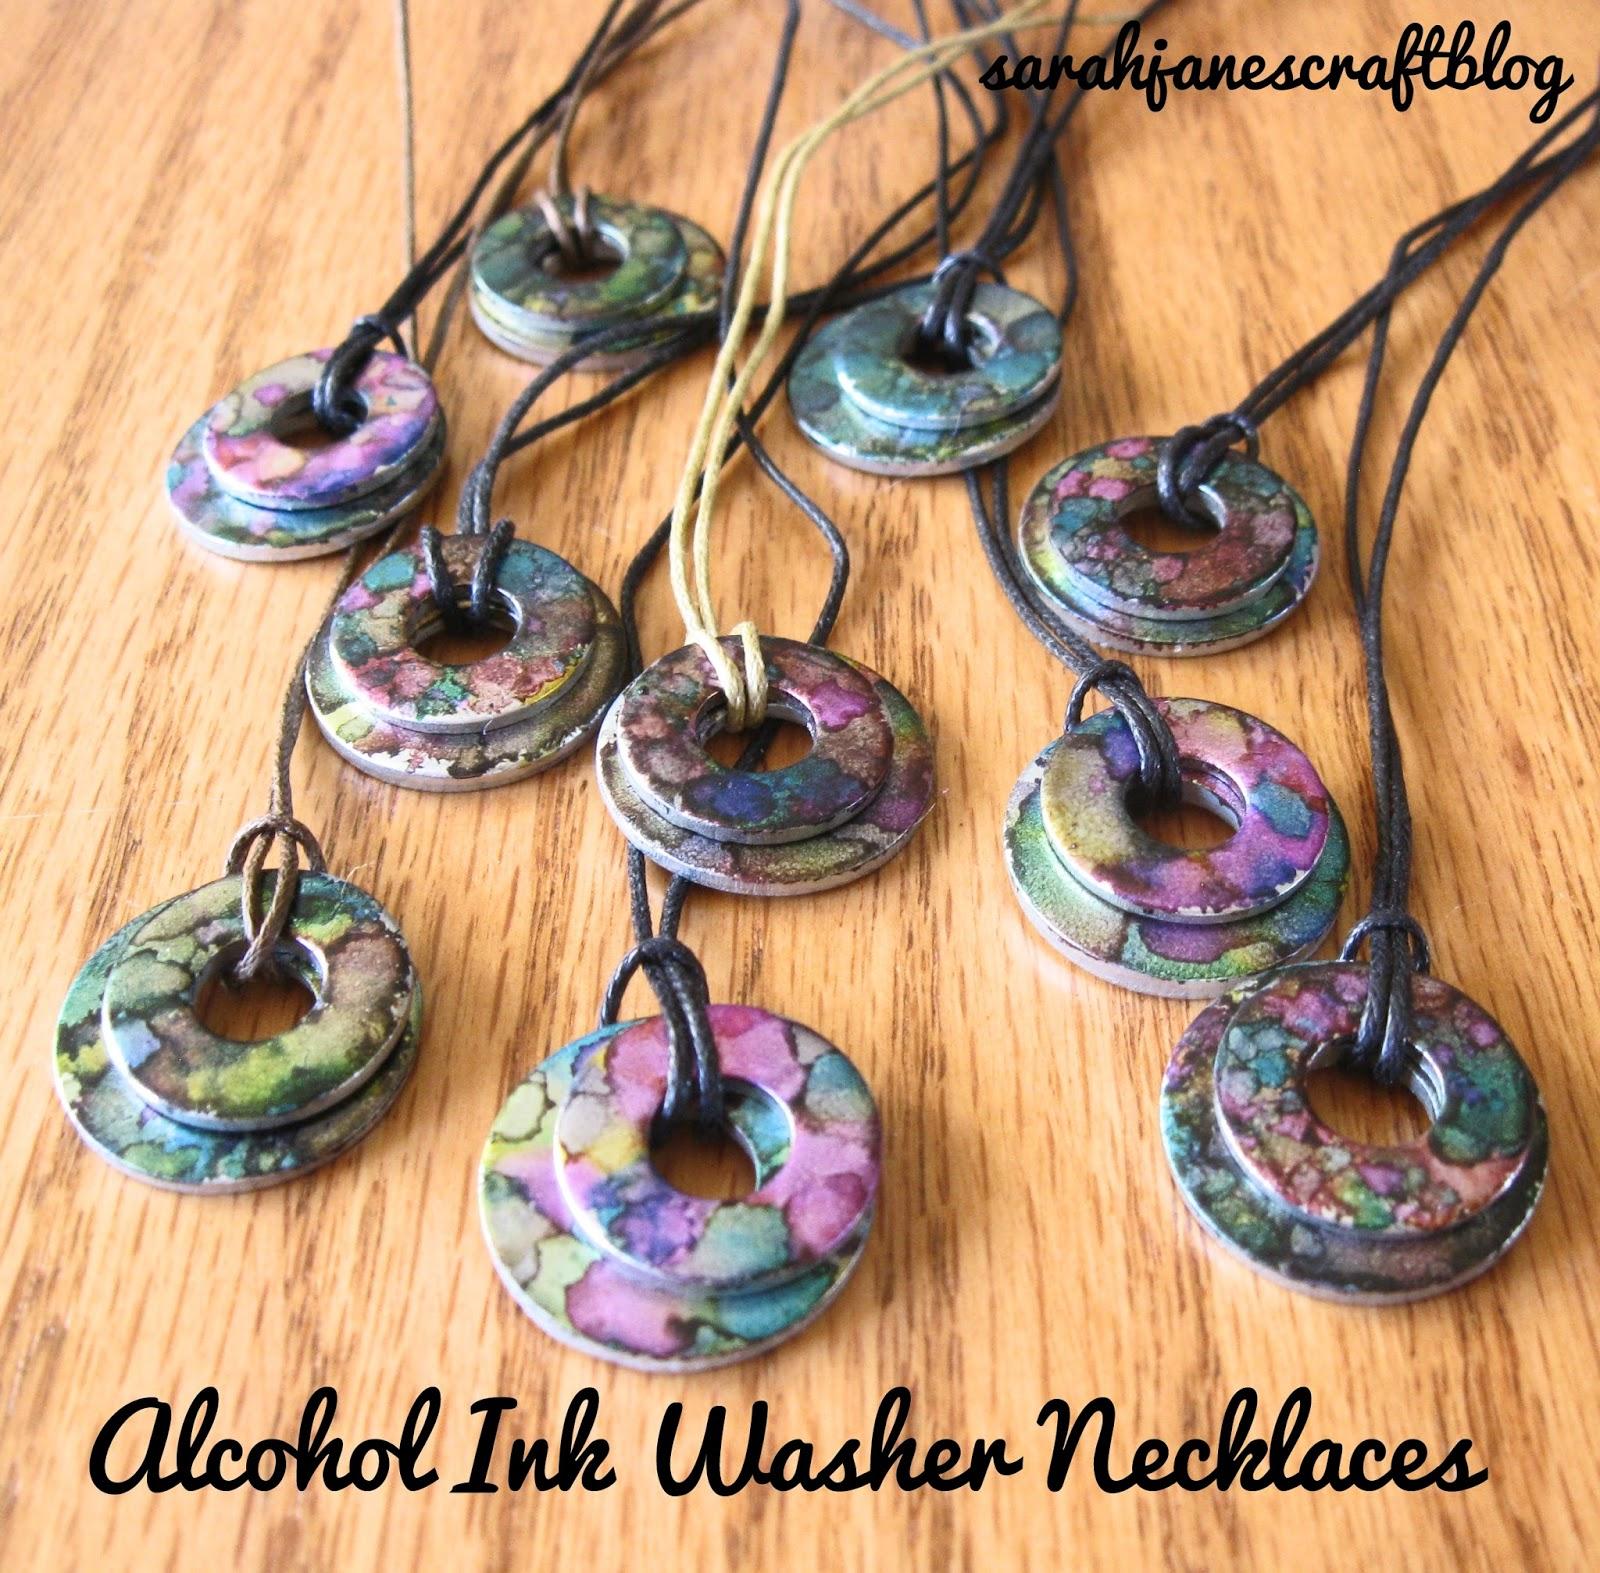 Sarah Jane S Craft Blog Alcohol Ink Washer Necklaces